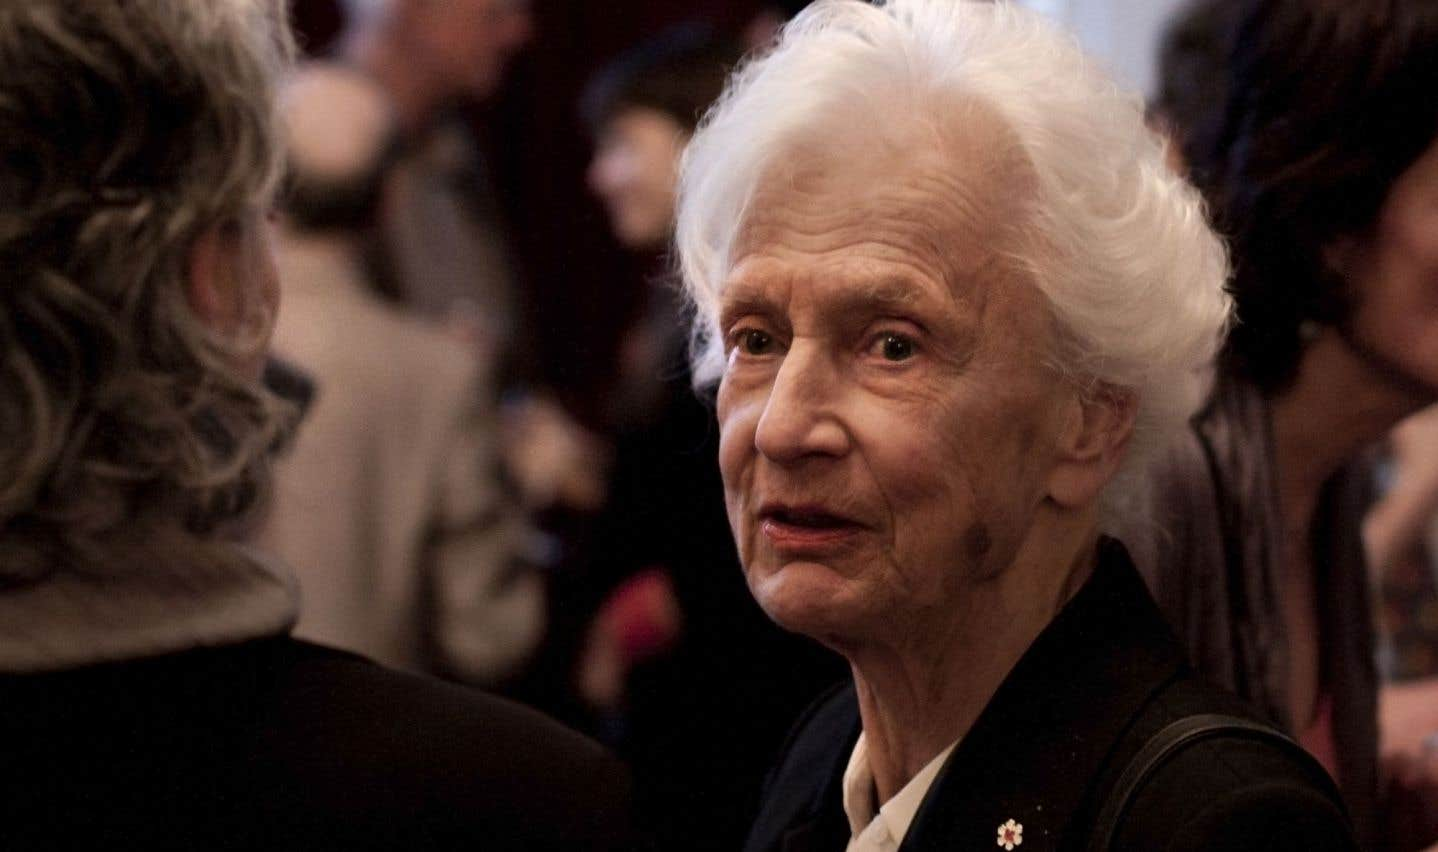 Mme Gretta Chambers, lors d'une conférence du philosophe Charles Taylor en 2012